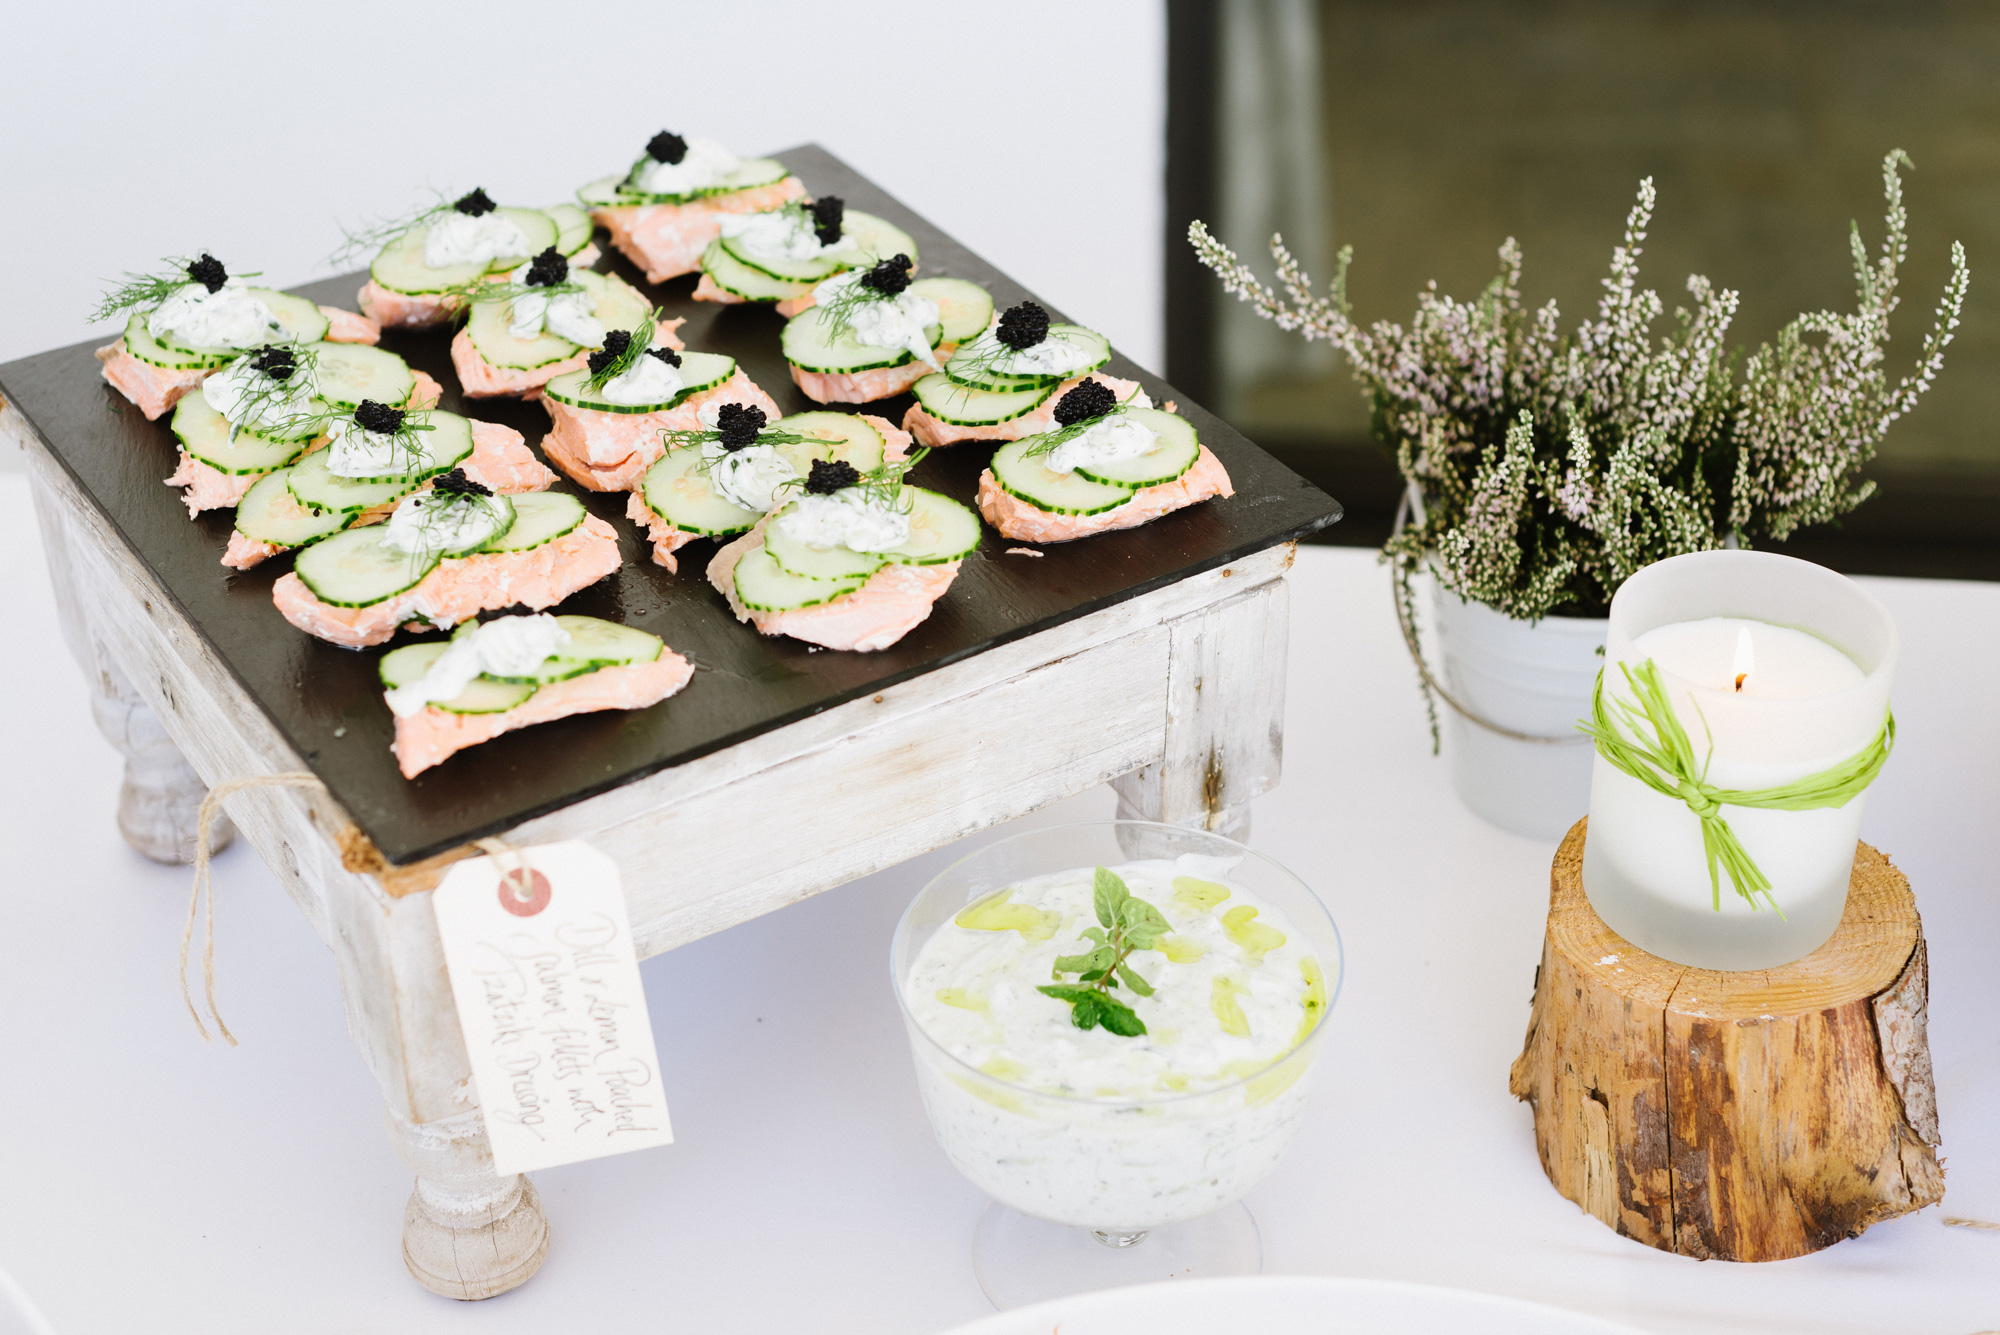 LoveFoodIbiza Ibiza Wedding Catering